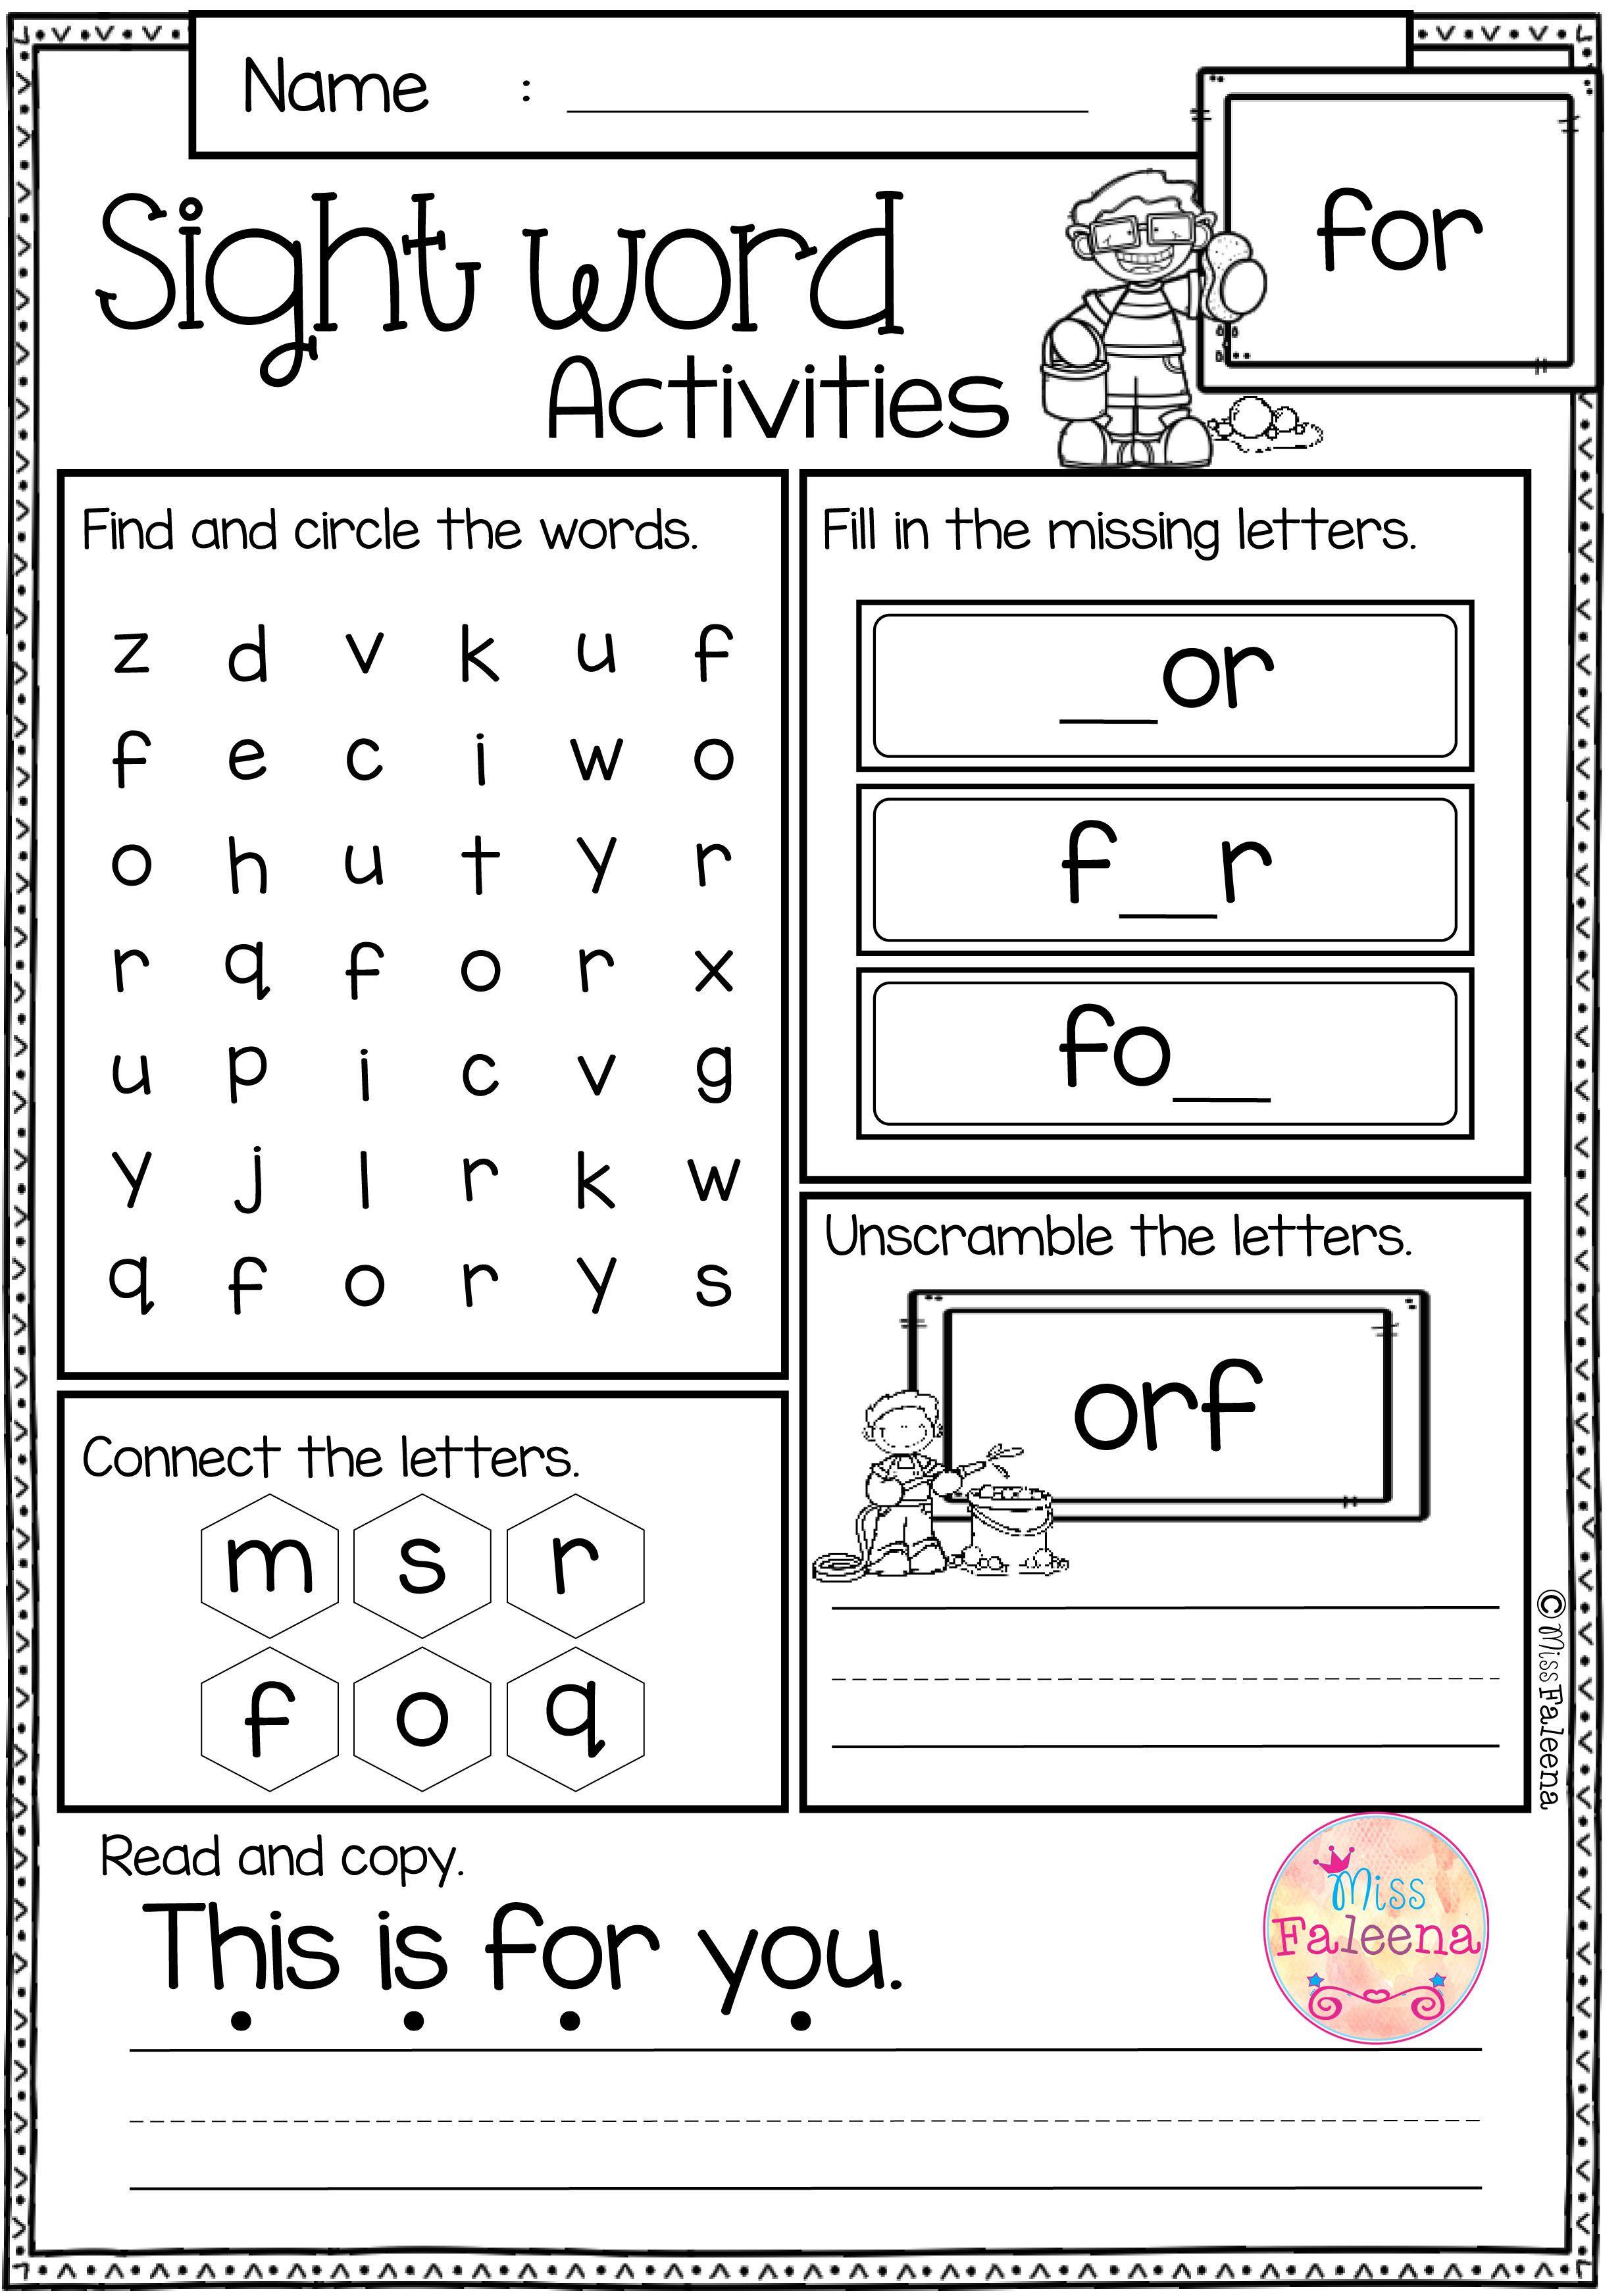 Free Sight Word Activities Sight Words Kindergarten Sight Word Worksheets Word Activities [ 3485 x 2468 Pixel ]